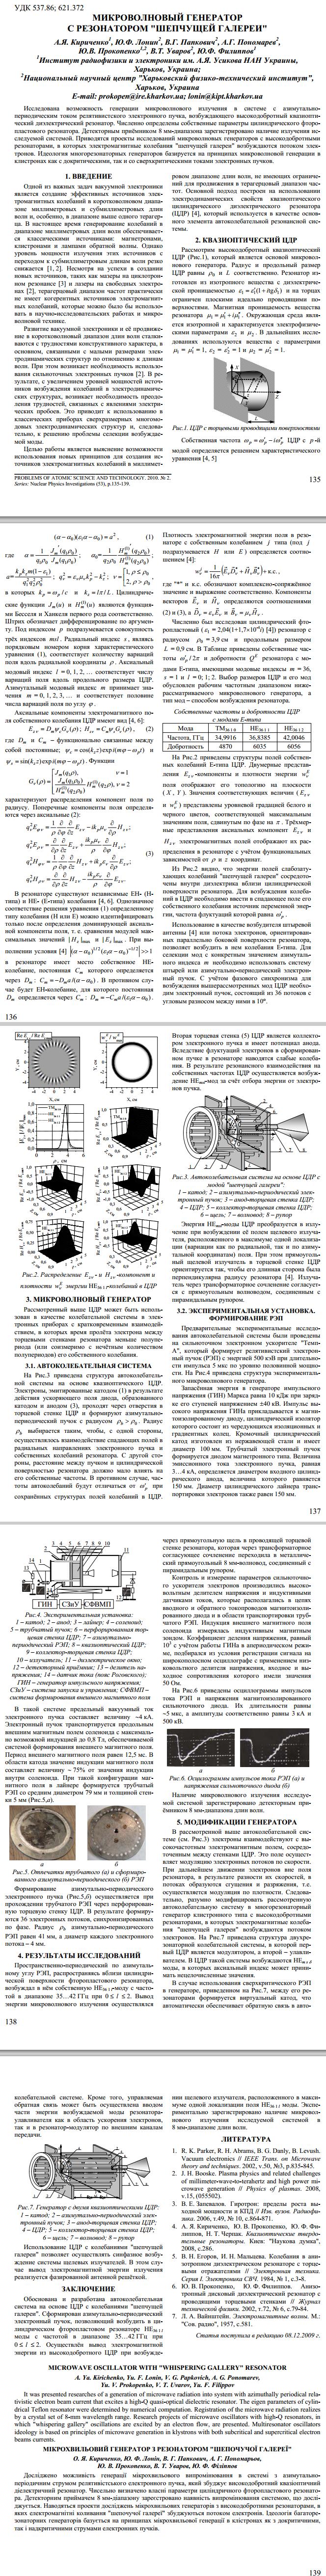 http://img-fotki.yandex.ru/get/4905/158289418.db/0_bfd13_d69b335f_orig.png